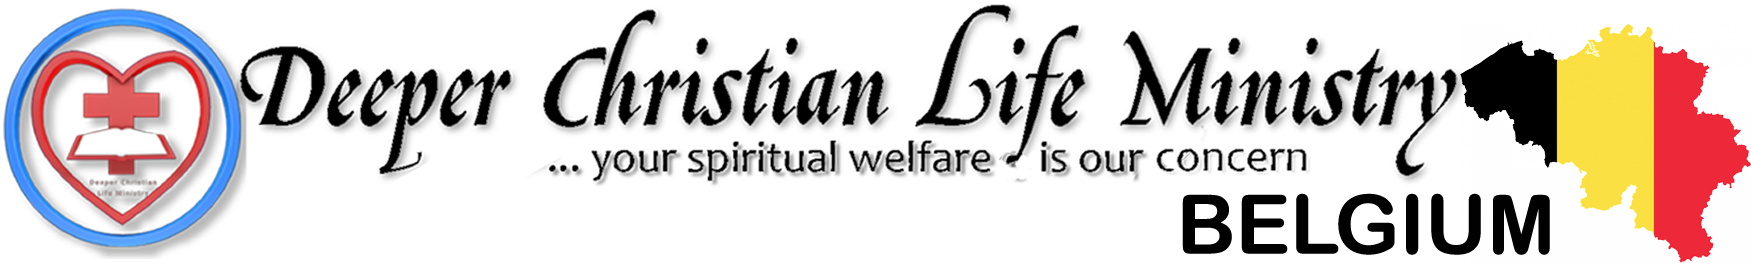 Deeper Christian Life Ministry Belgium